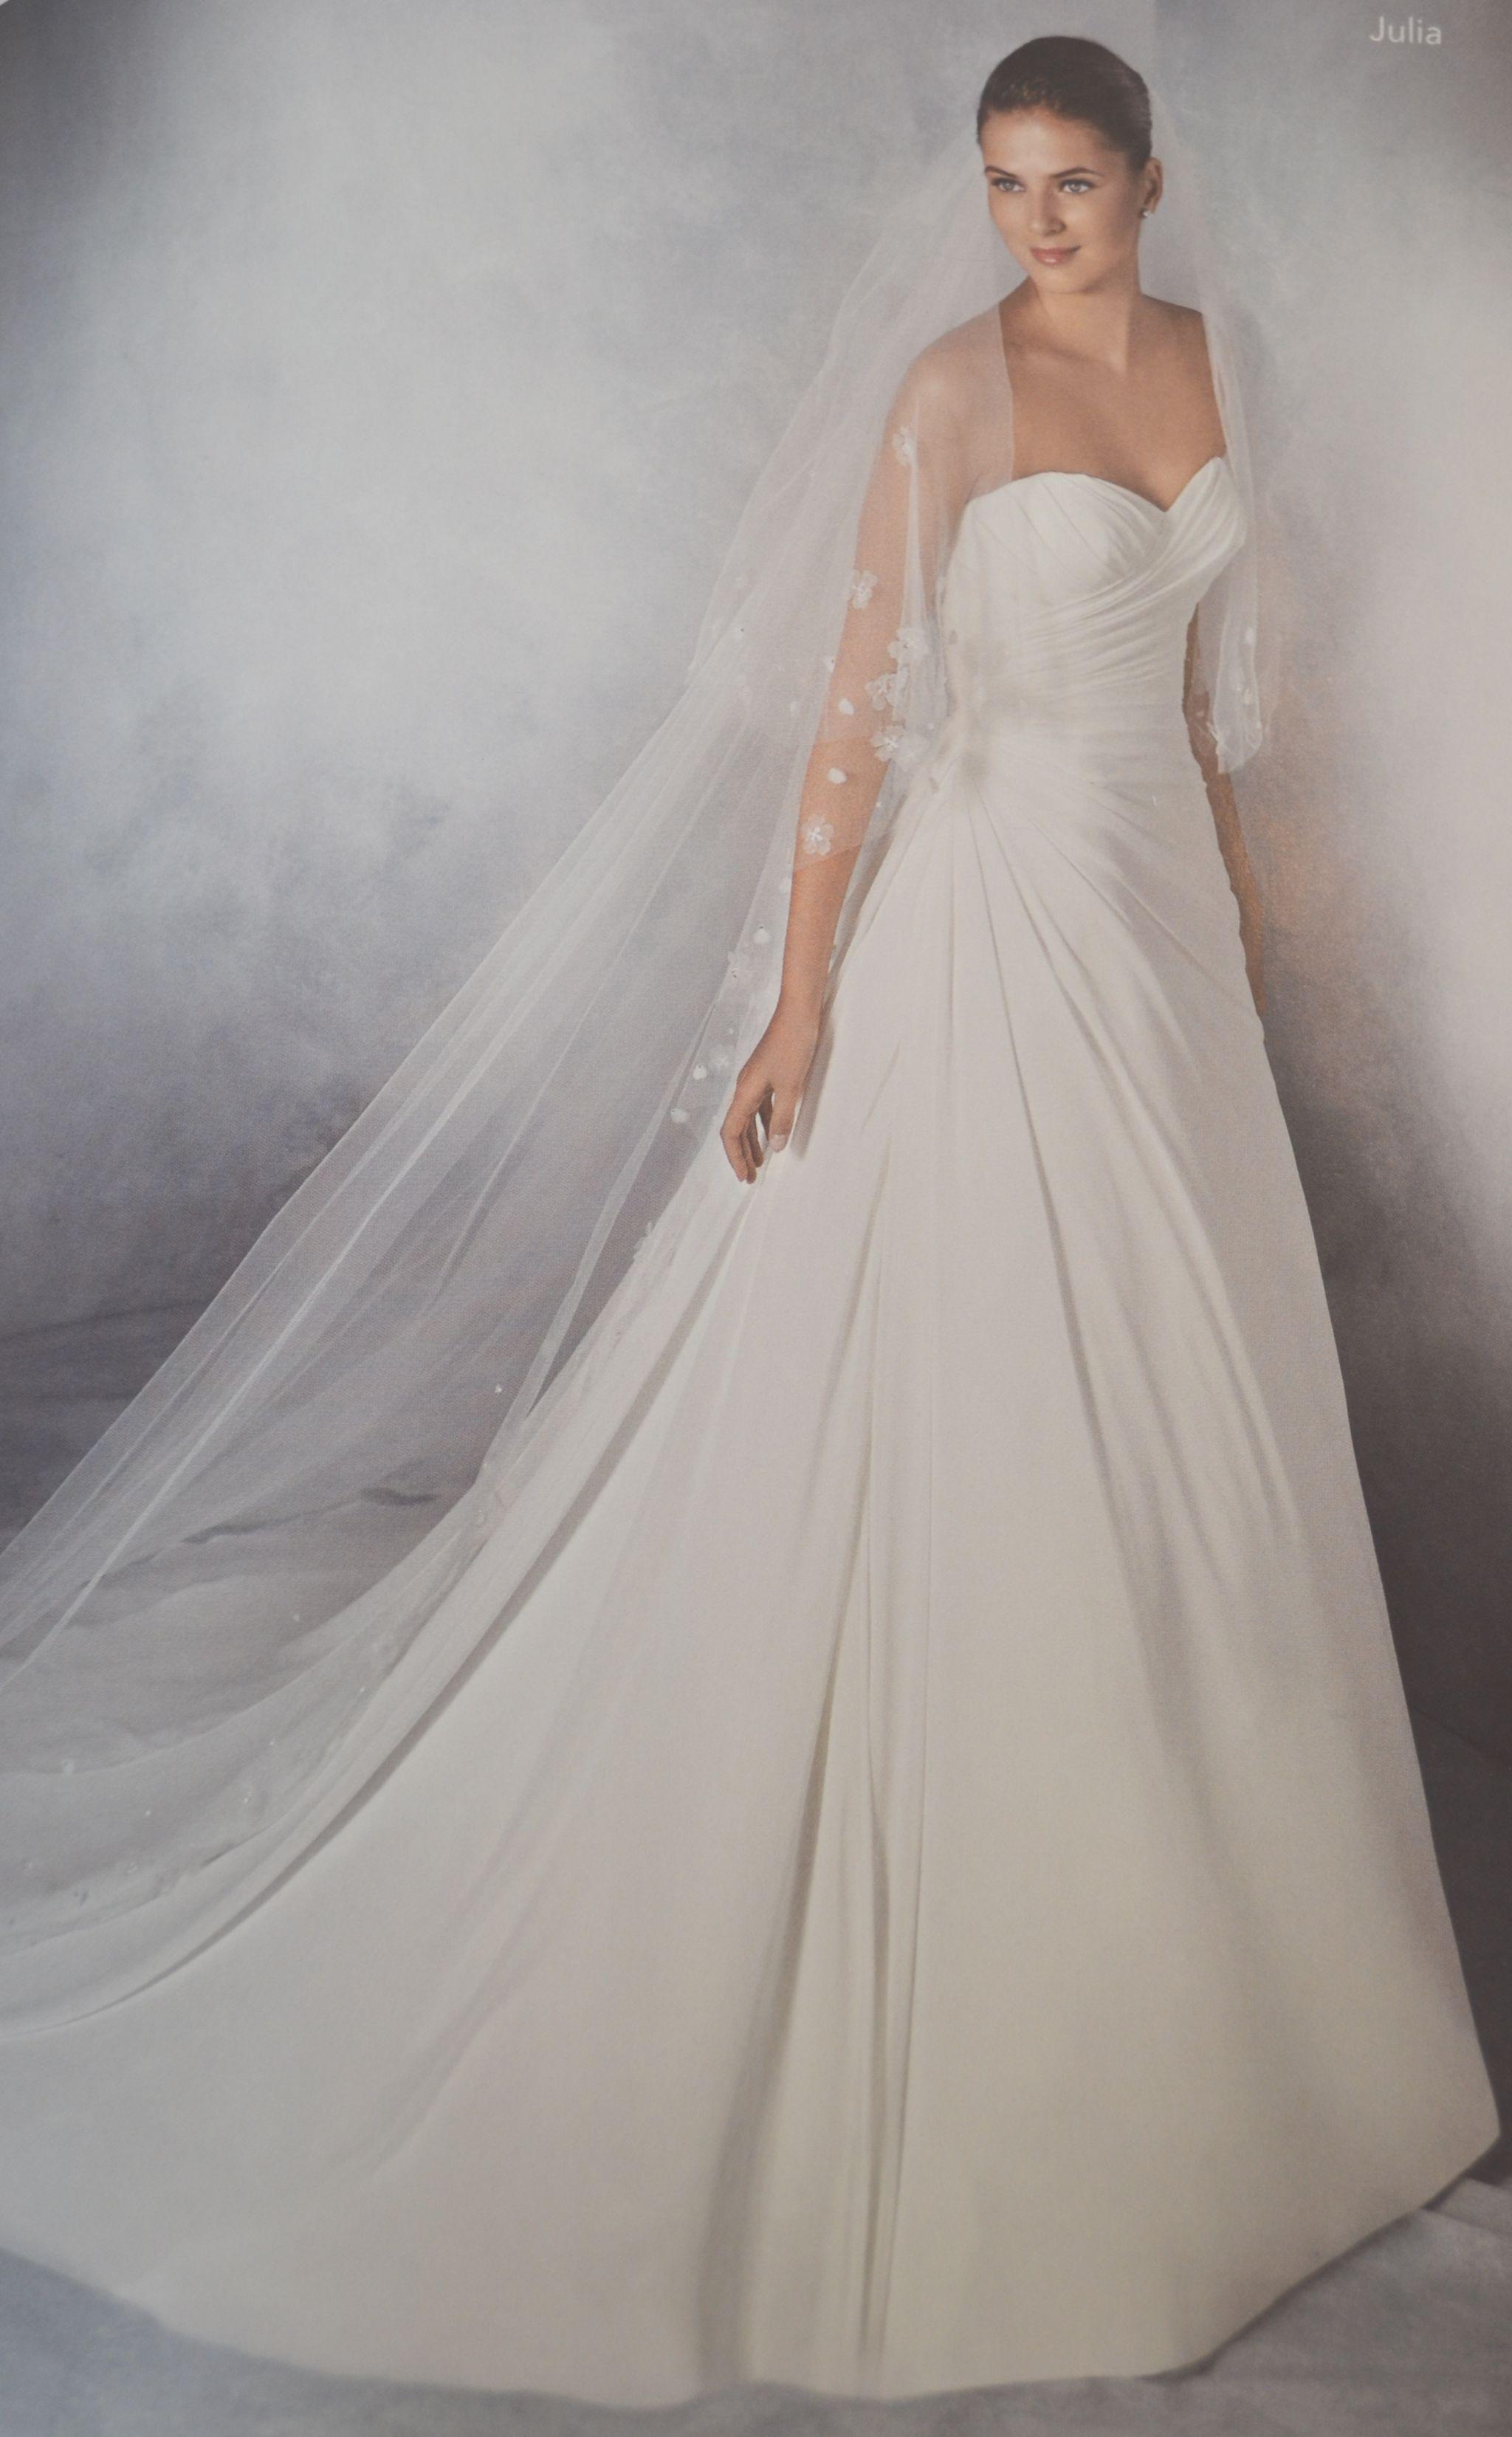 Pronovias Pro Julia 299 Size 14 Sample Wedding Dresses Lovely